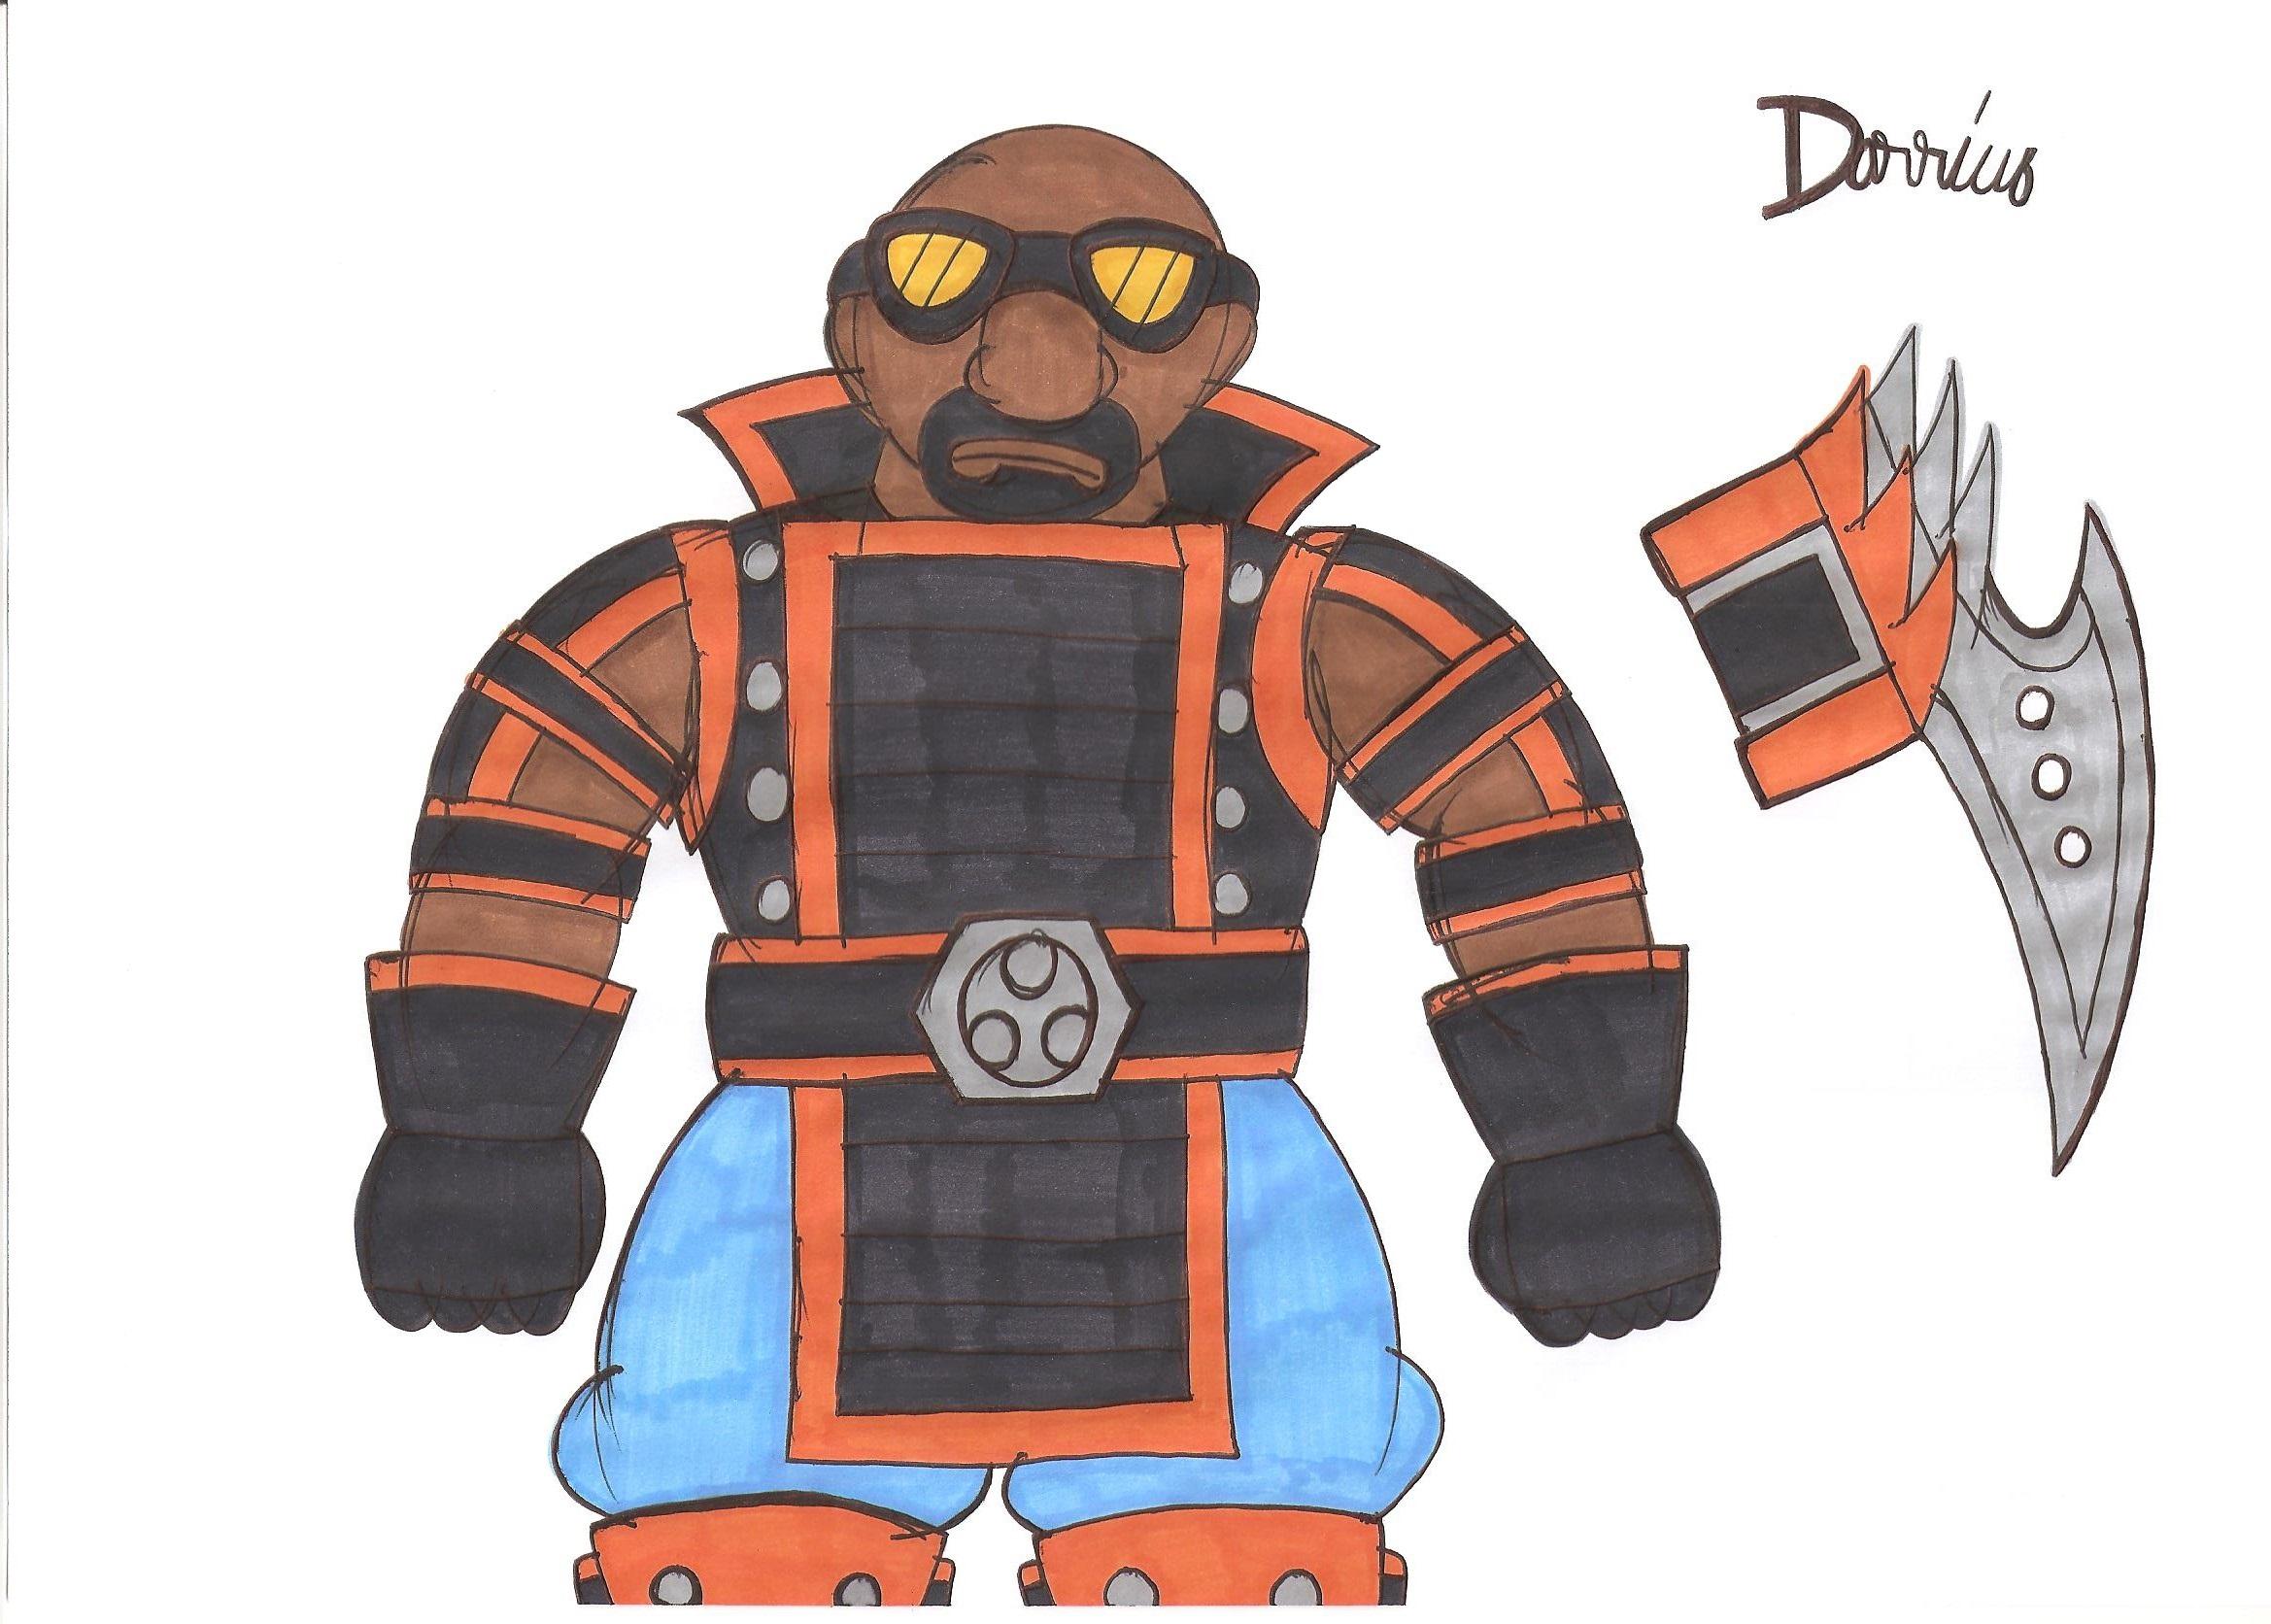 mortal kombat deception darrius by cargocamp on deviantart